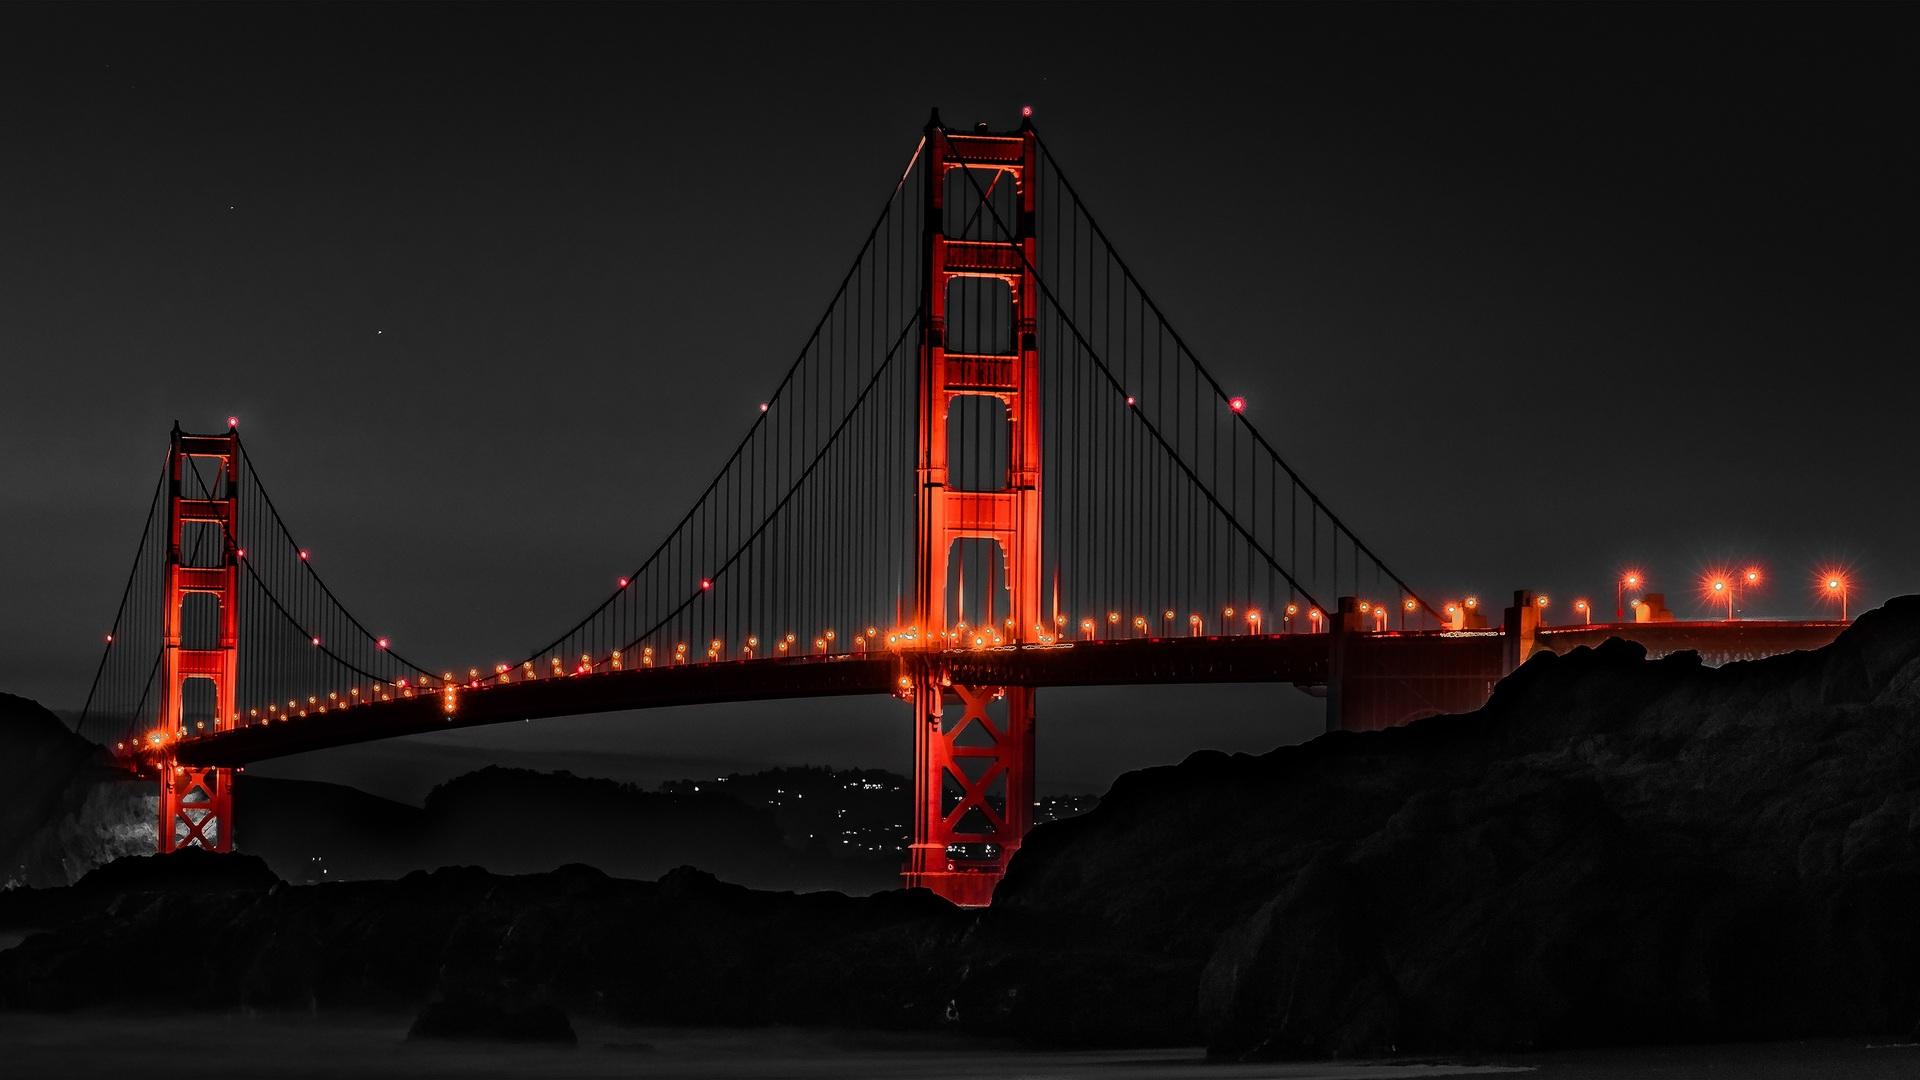 1920x1080 Golden Gate Bridge San Francisco Night Laptop